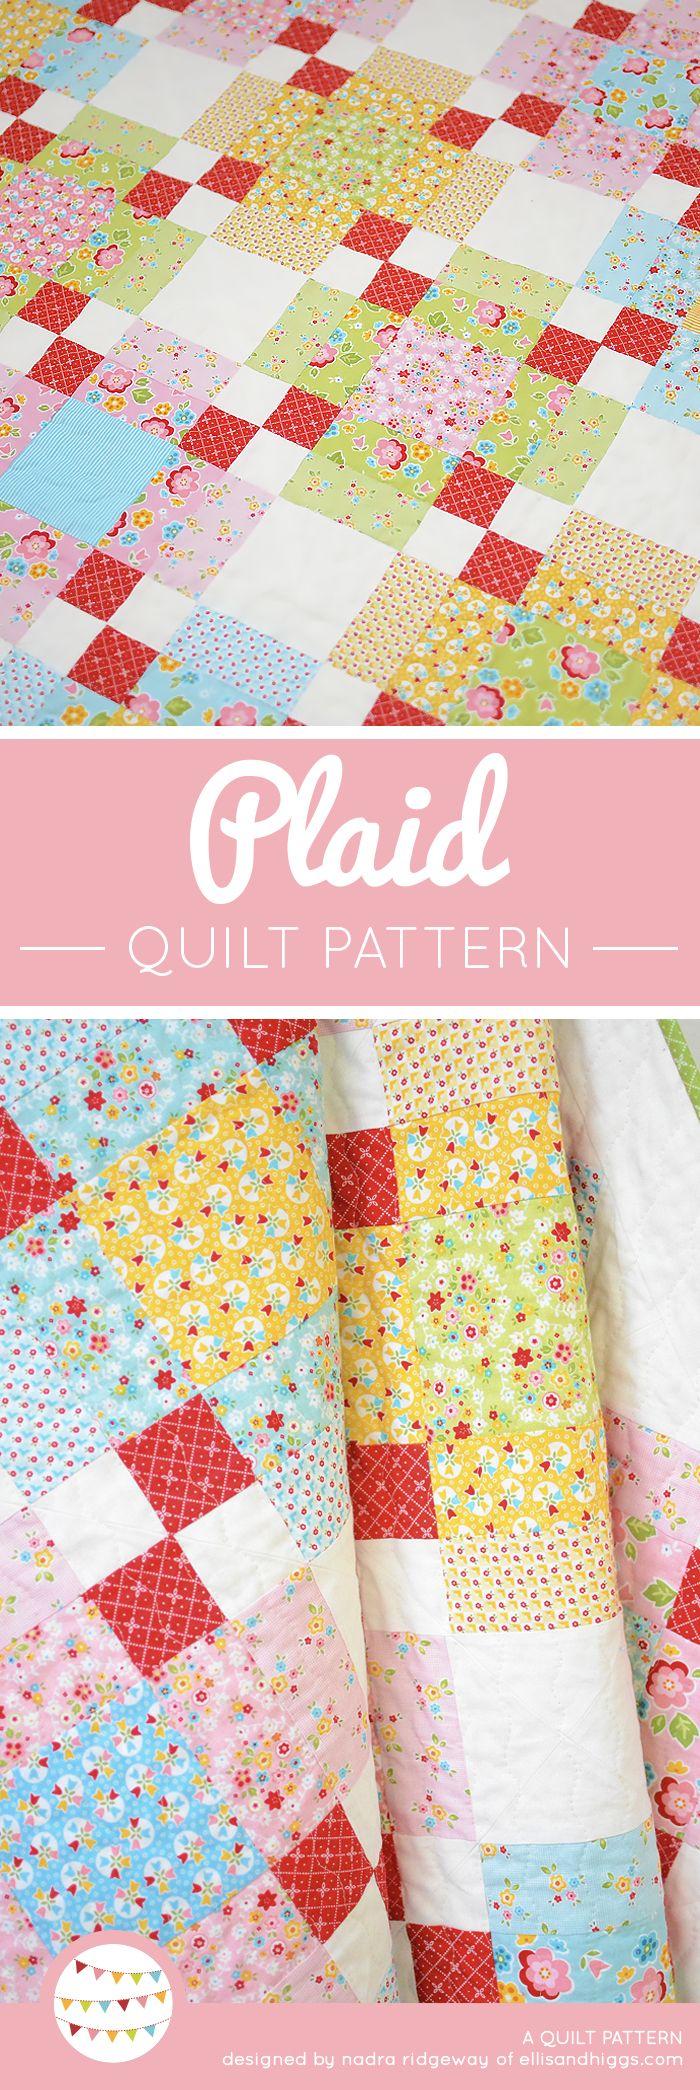 Plaid quilt pattern by Nadra Ridgeway of ellis & higgs. Fast and easy quilt pattern, quilt block. Patchwork Anleitung, Anfänger, Nähanleitung, Mini Quilt, Geschenke nähen, DIY